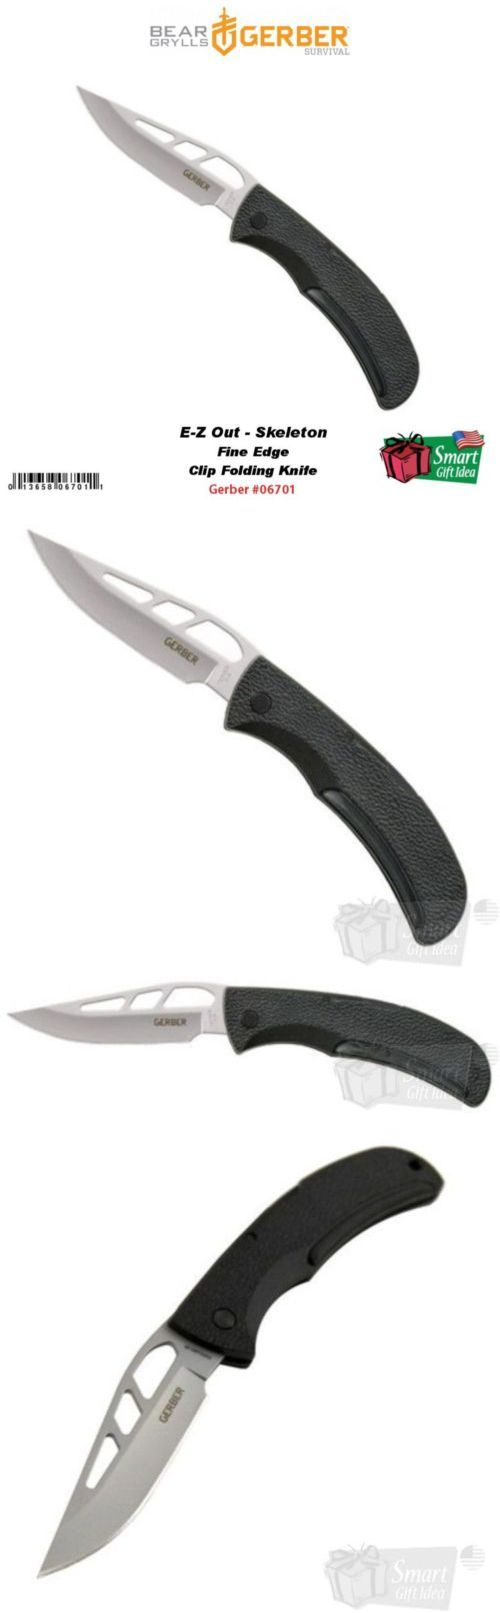 best 20 cooking utensils ideas on pinterest scottish kitchen camping cooking utensils 87133 gerber e z out skeleton fine edge folding clip knife softgrip